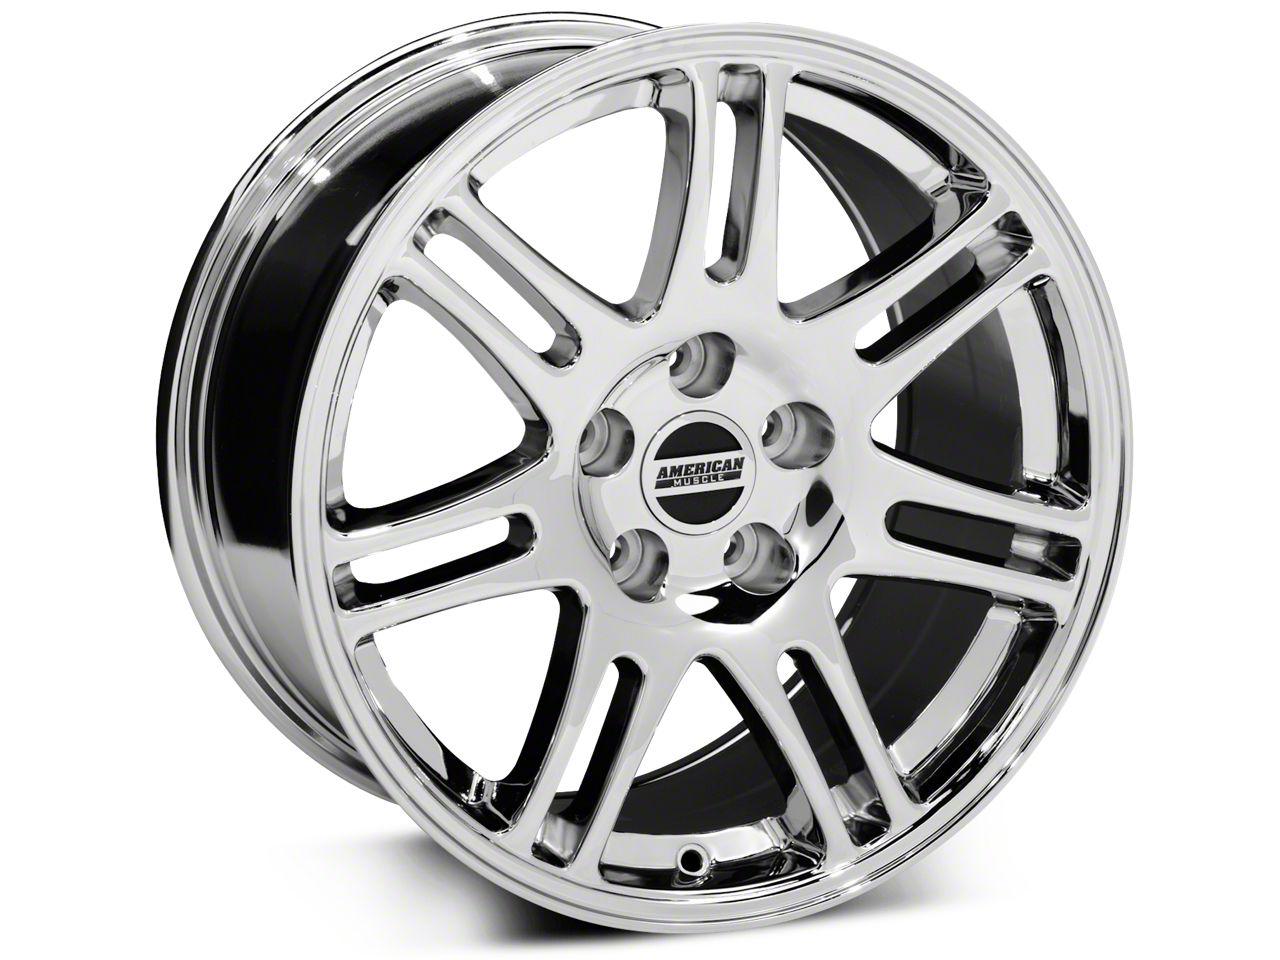 cobra style mustang wheels americanmuscle 03-04 Cobra cobra style mustang wheels